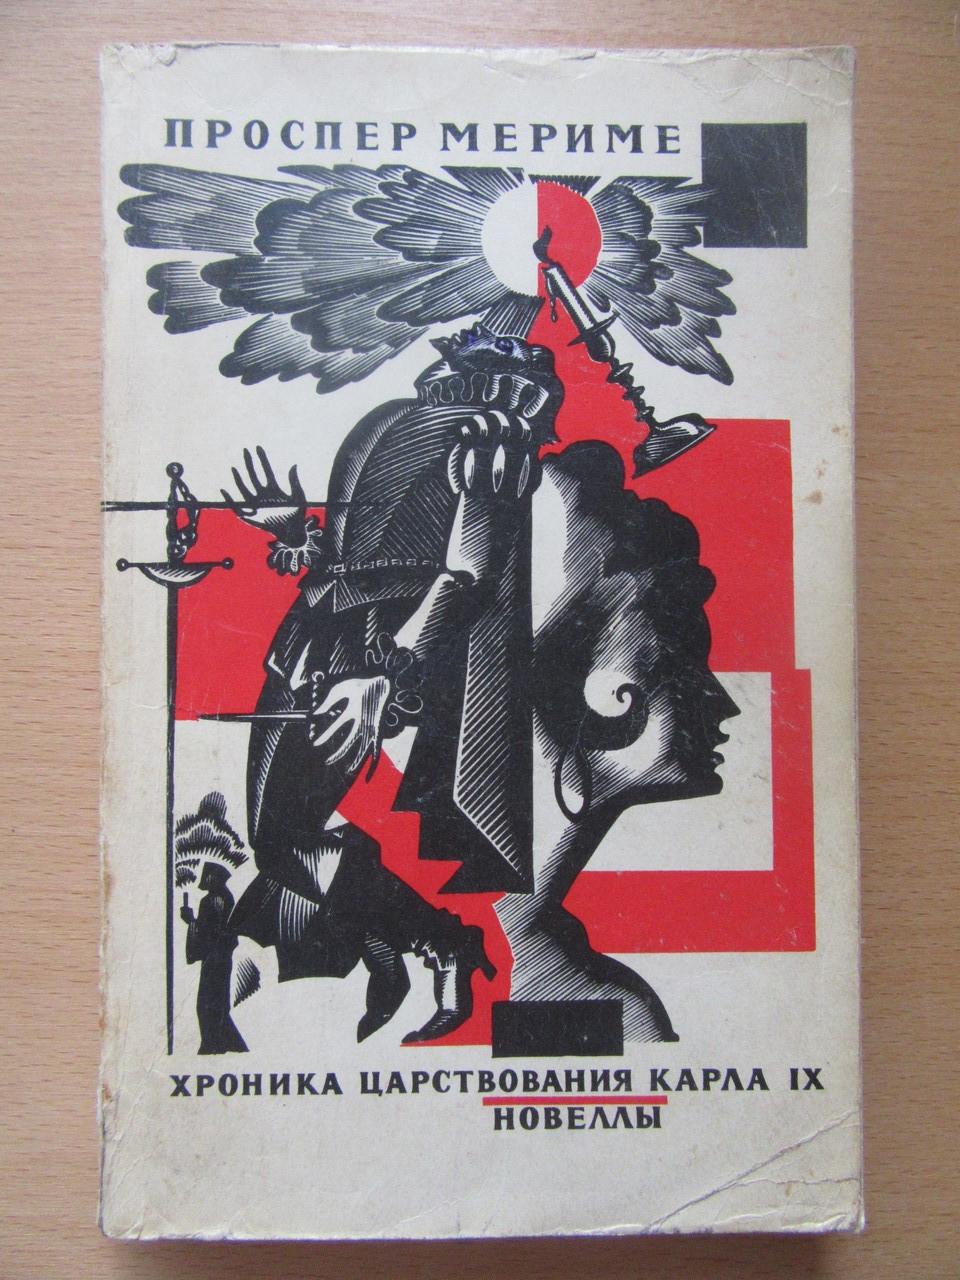 Проспер Мериме. Хроника царствования Карла IX. Новеллы